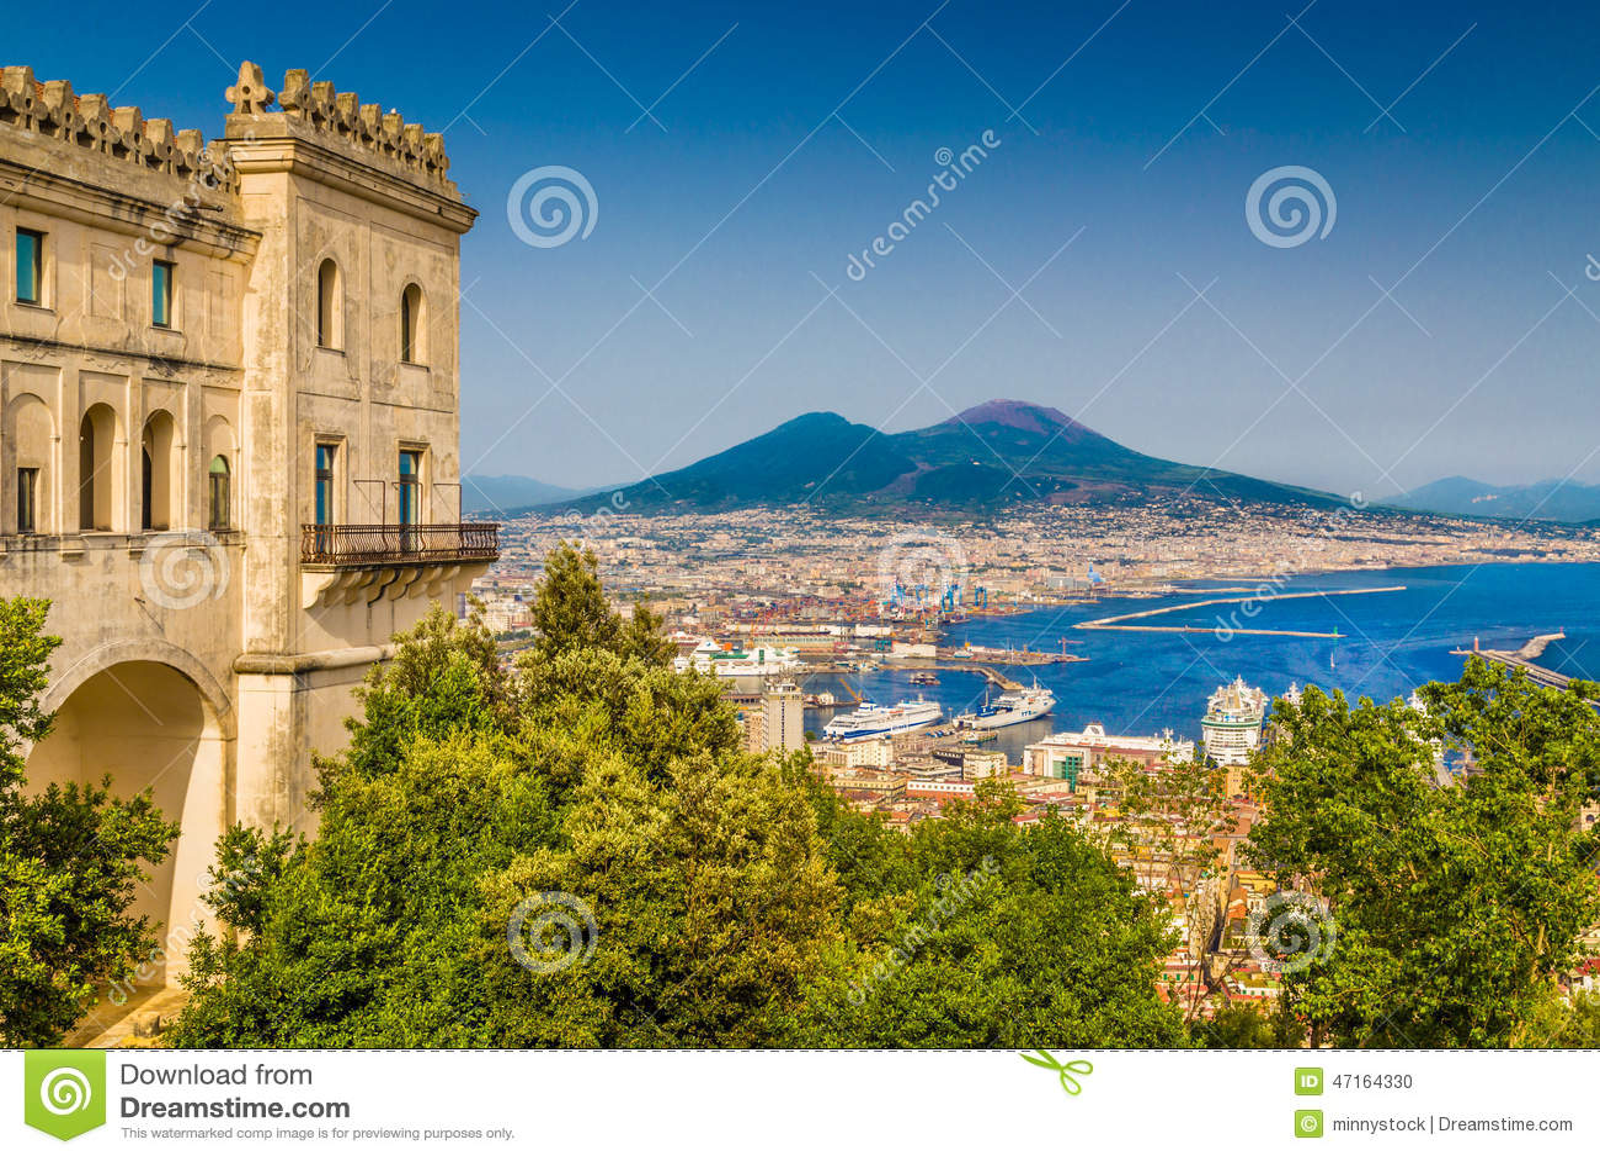 Aerial view of Naples with Mt Vesuvius, Campania, Italy